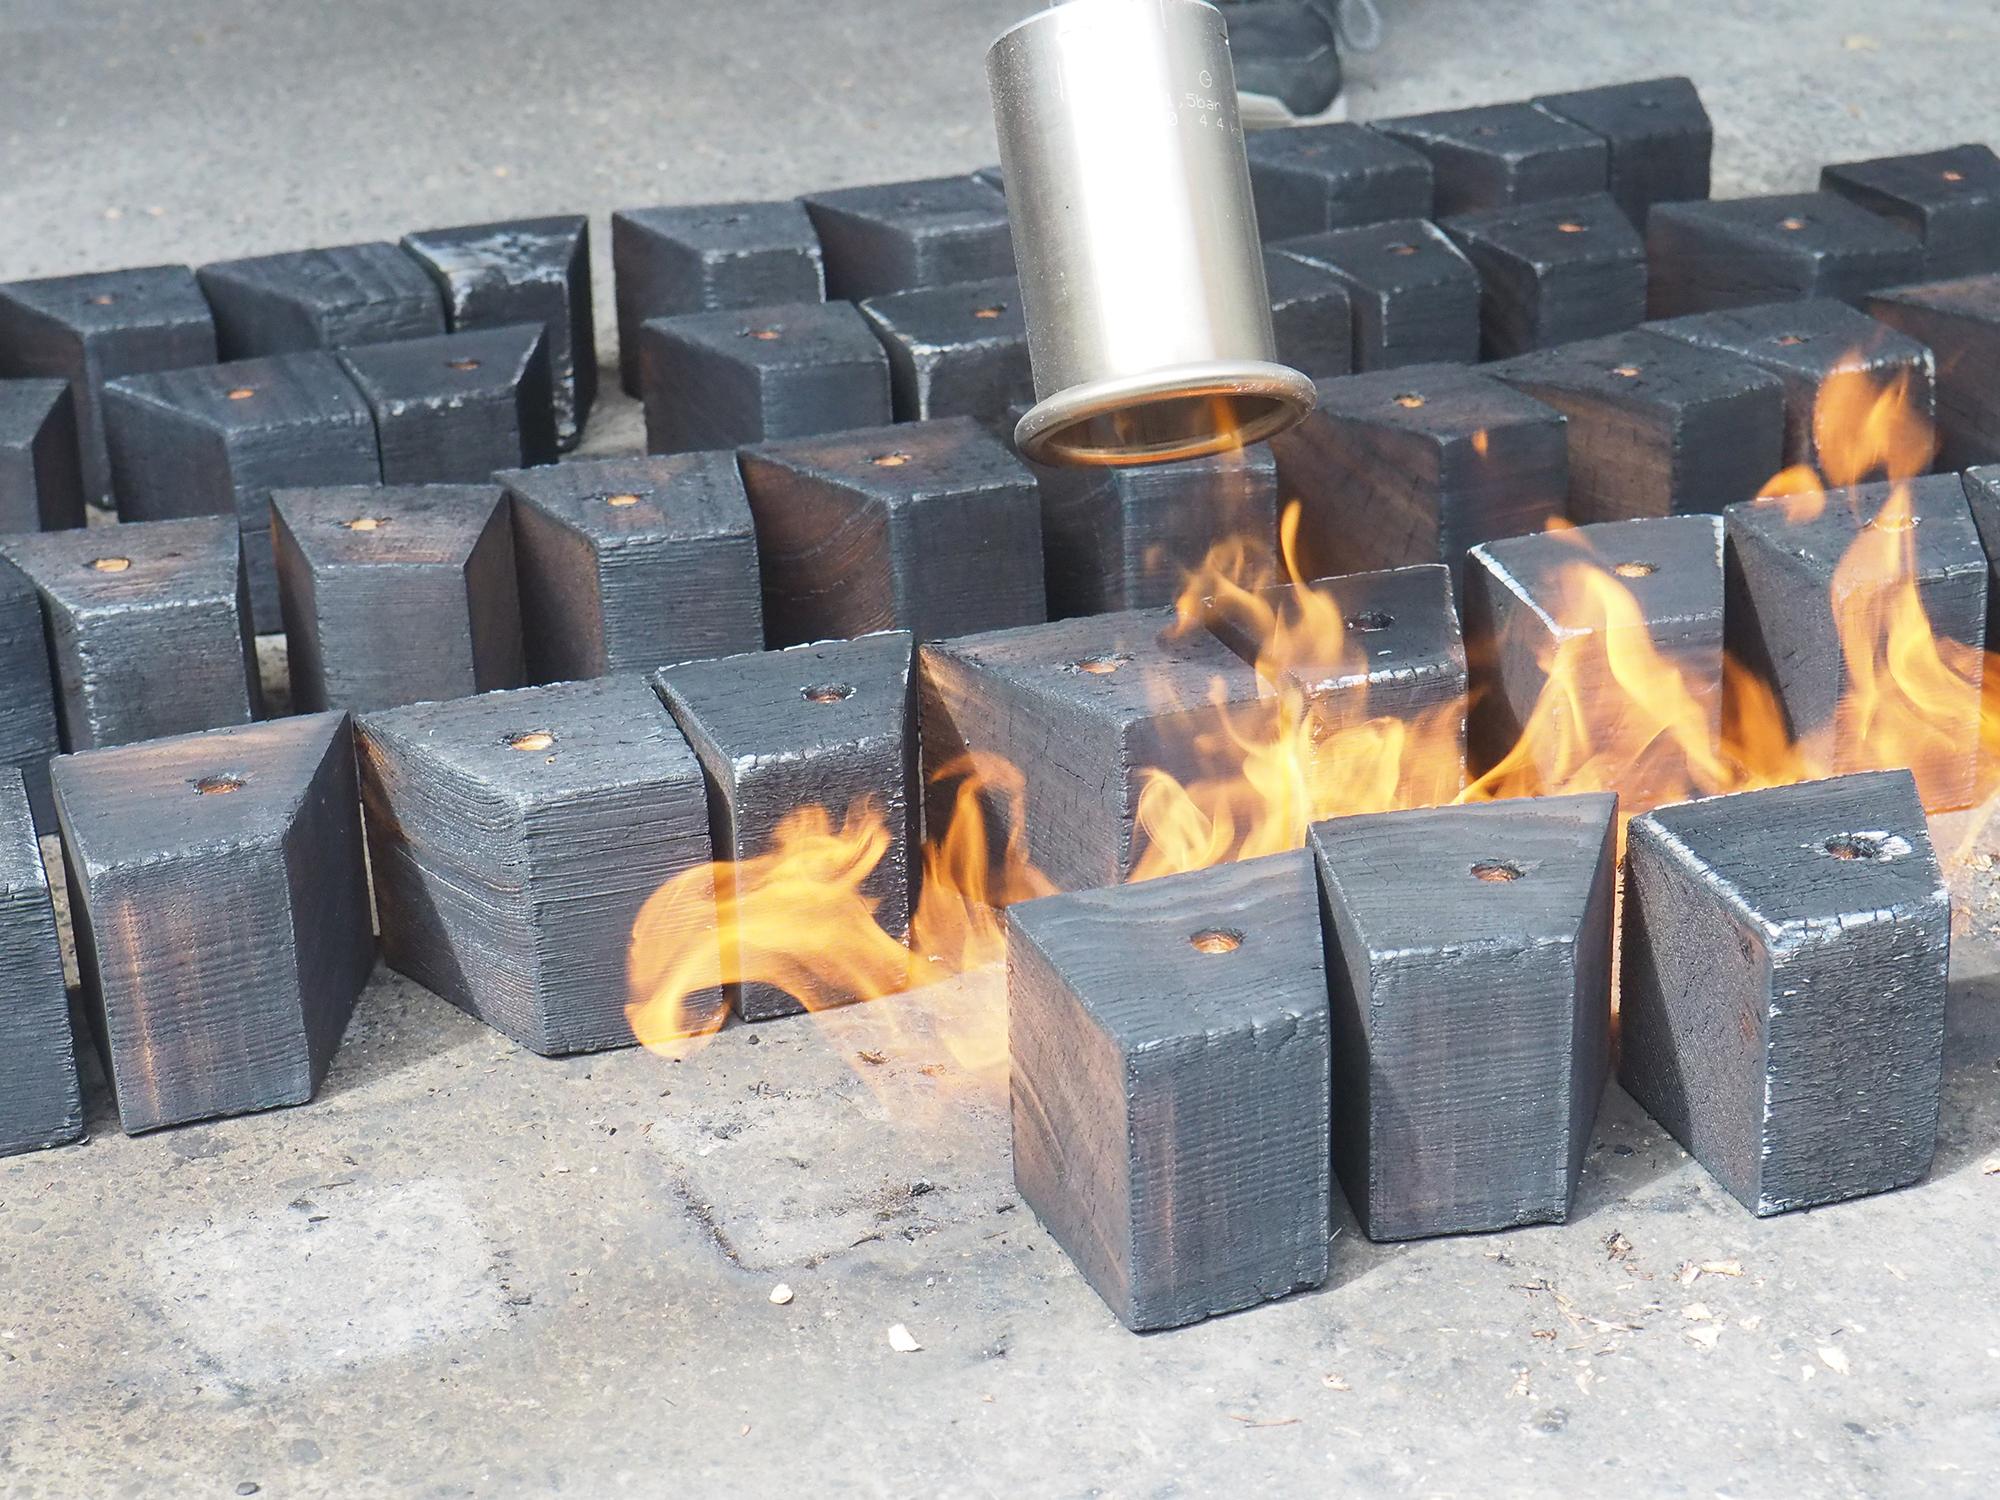 SoWatt-WIP-Sculpture-Corporate-Art-Timber-Oregon-Steel-Copper-Deloitte-05.JPG